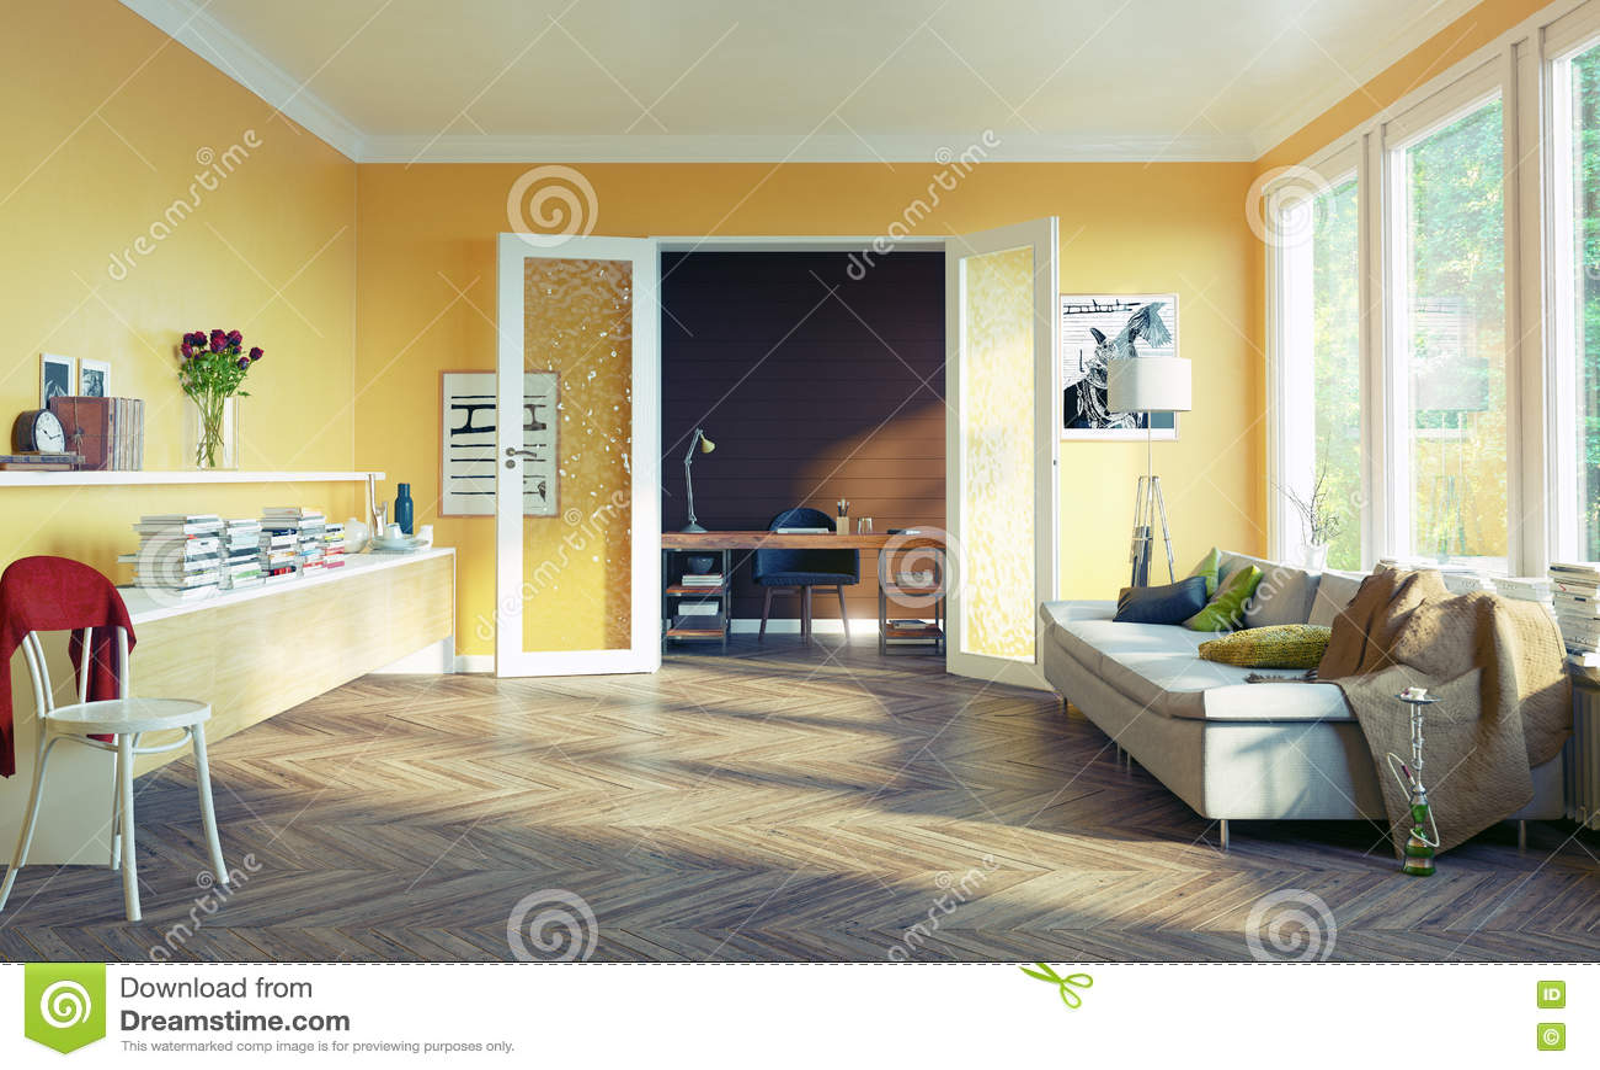 Living room interior stock illustration image 70196255